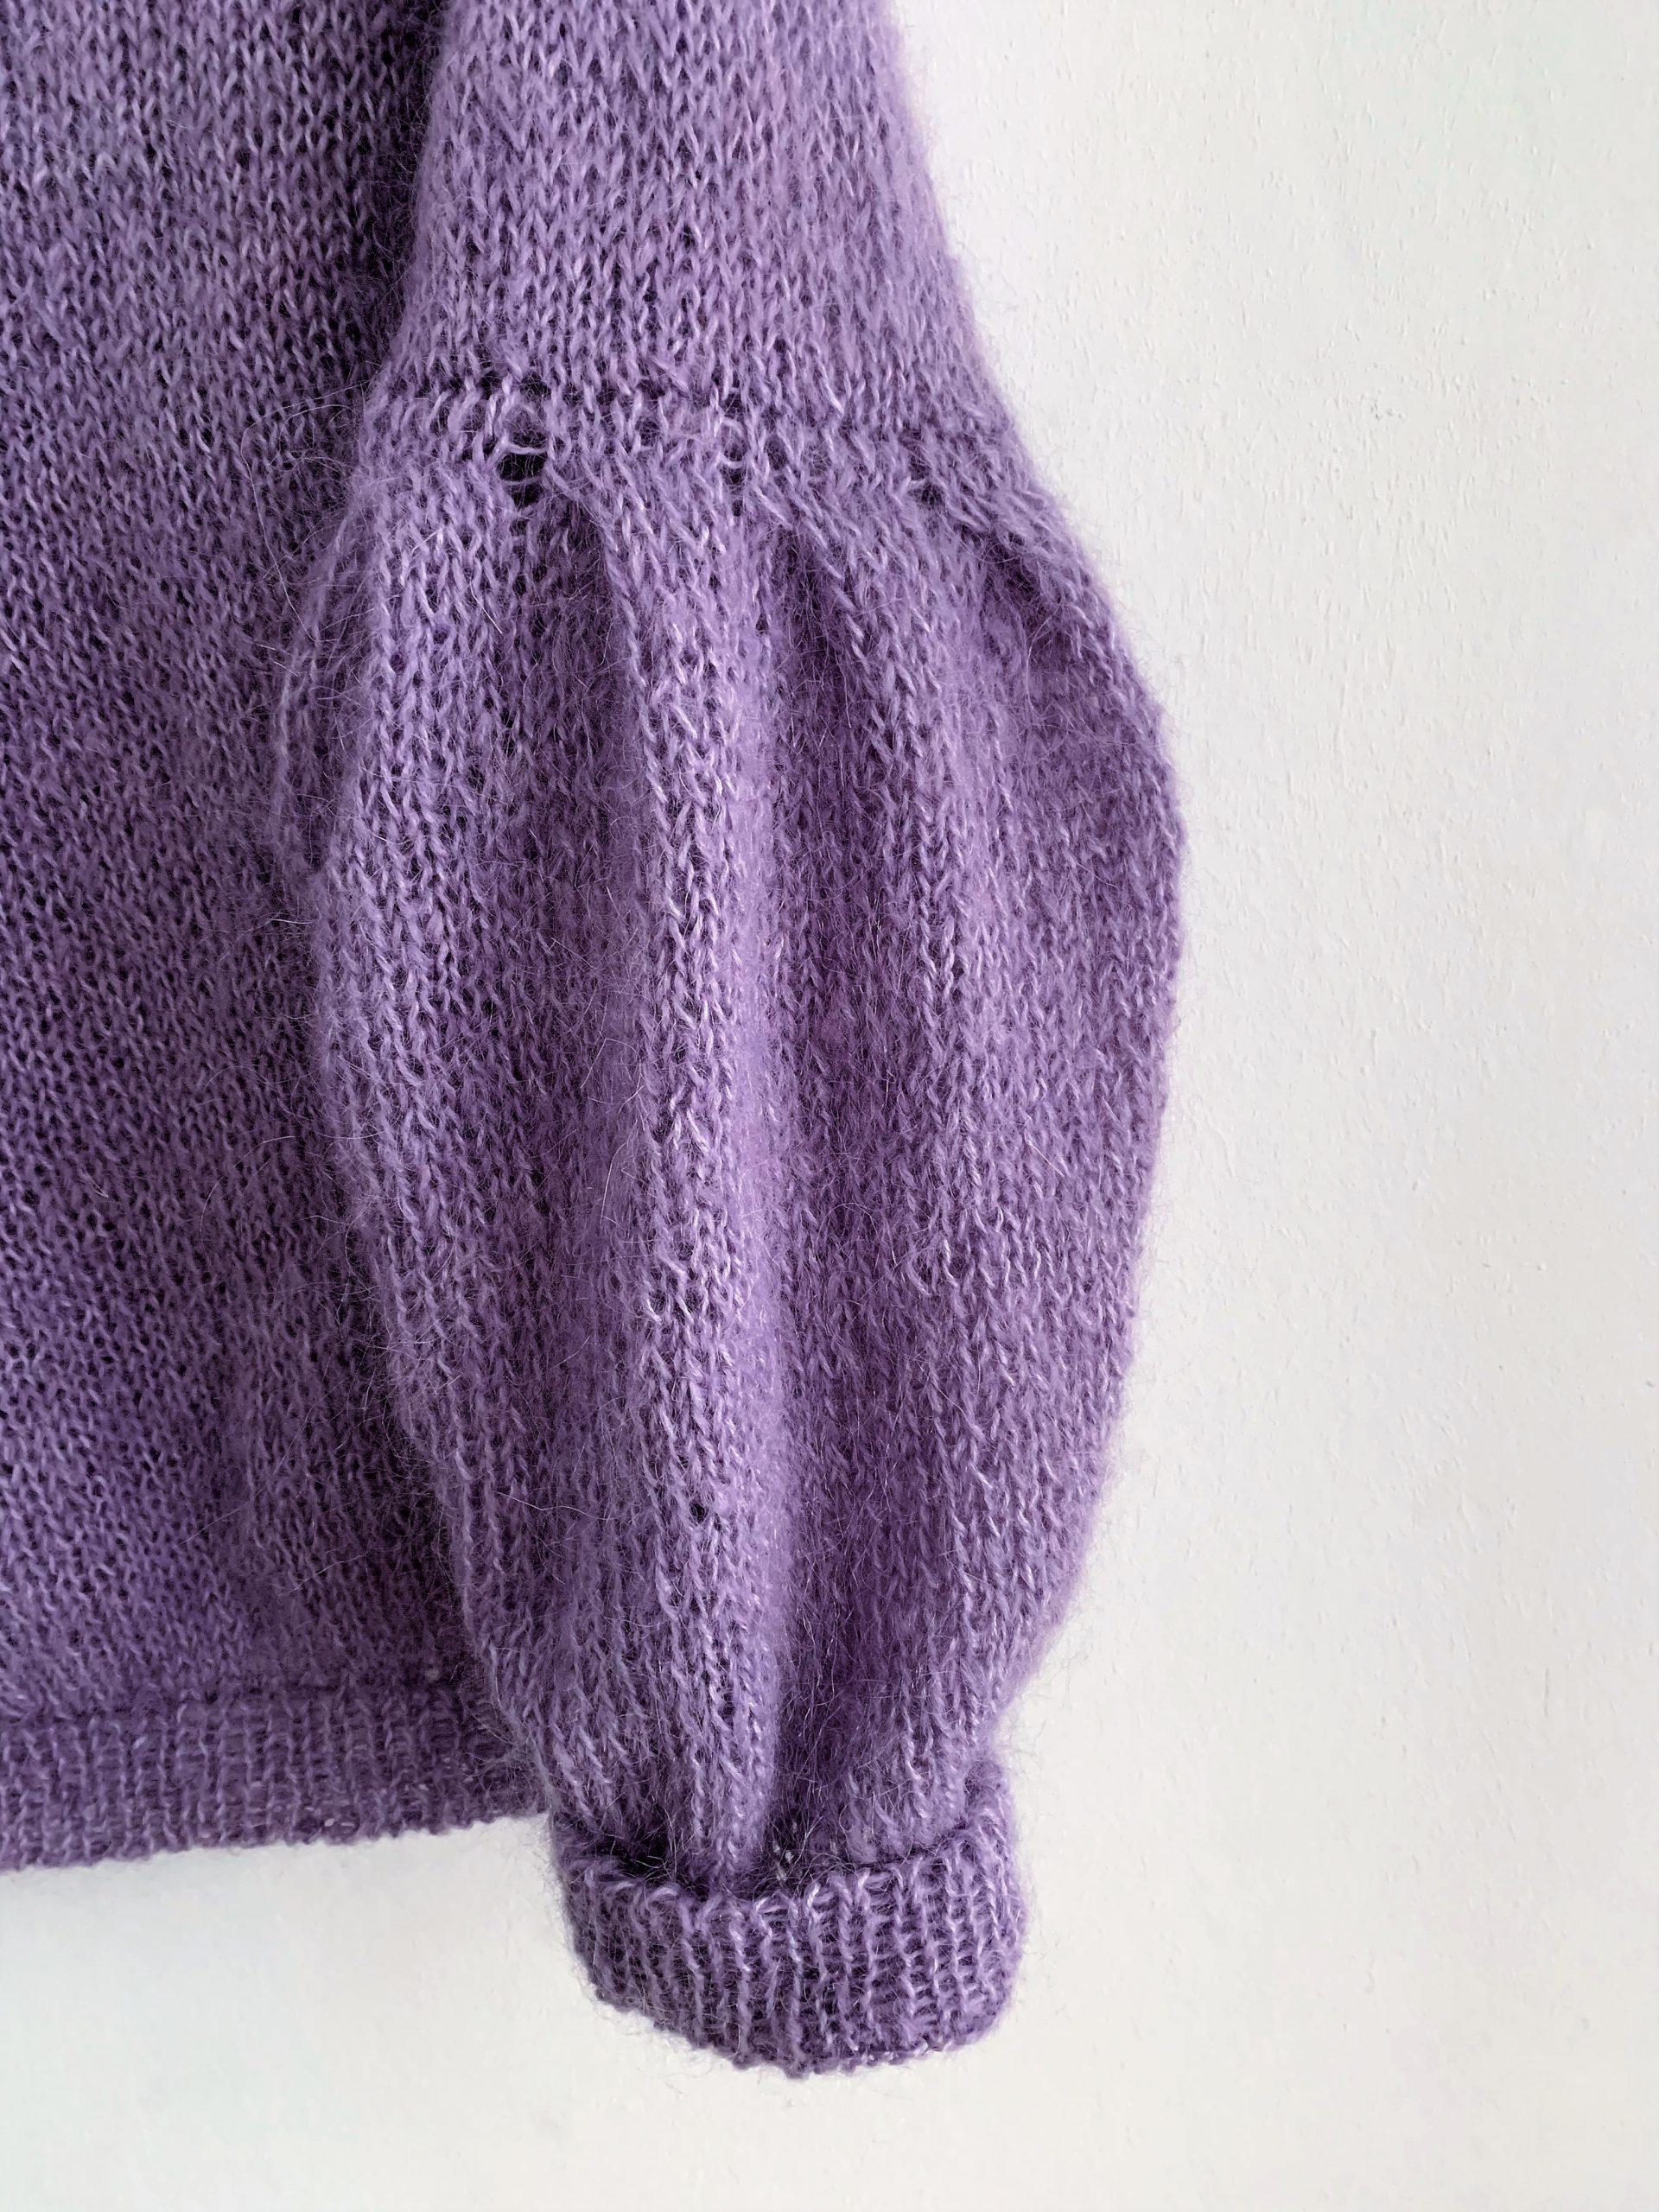 Paarse gebreide trui dames Gebreide winter mode 2020 2021